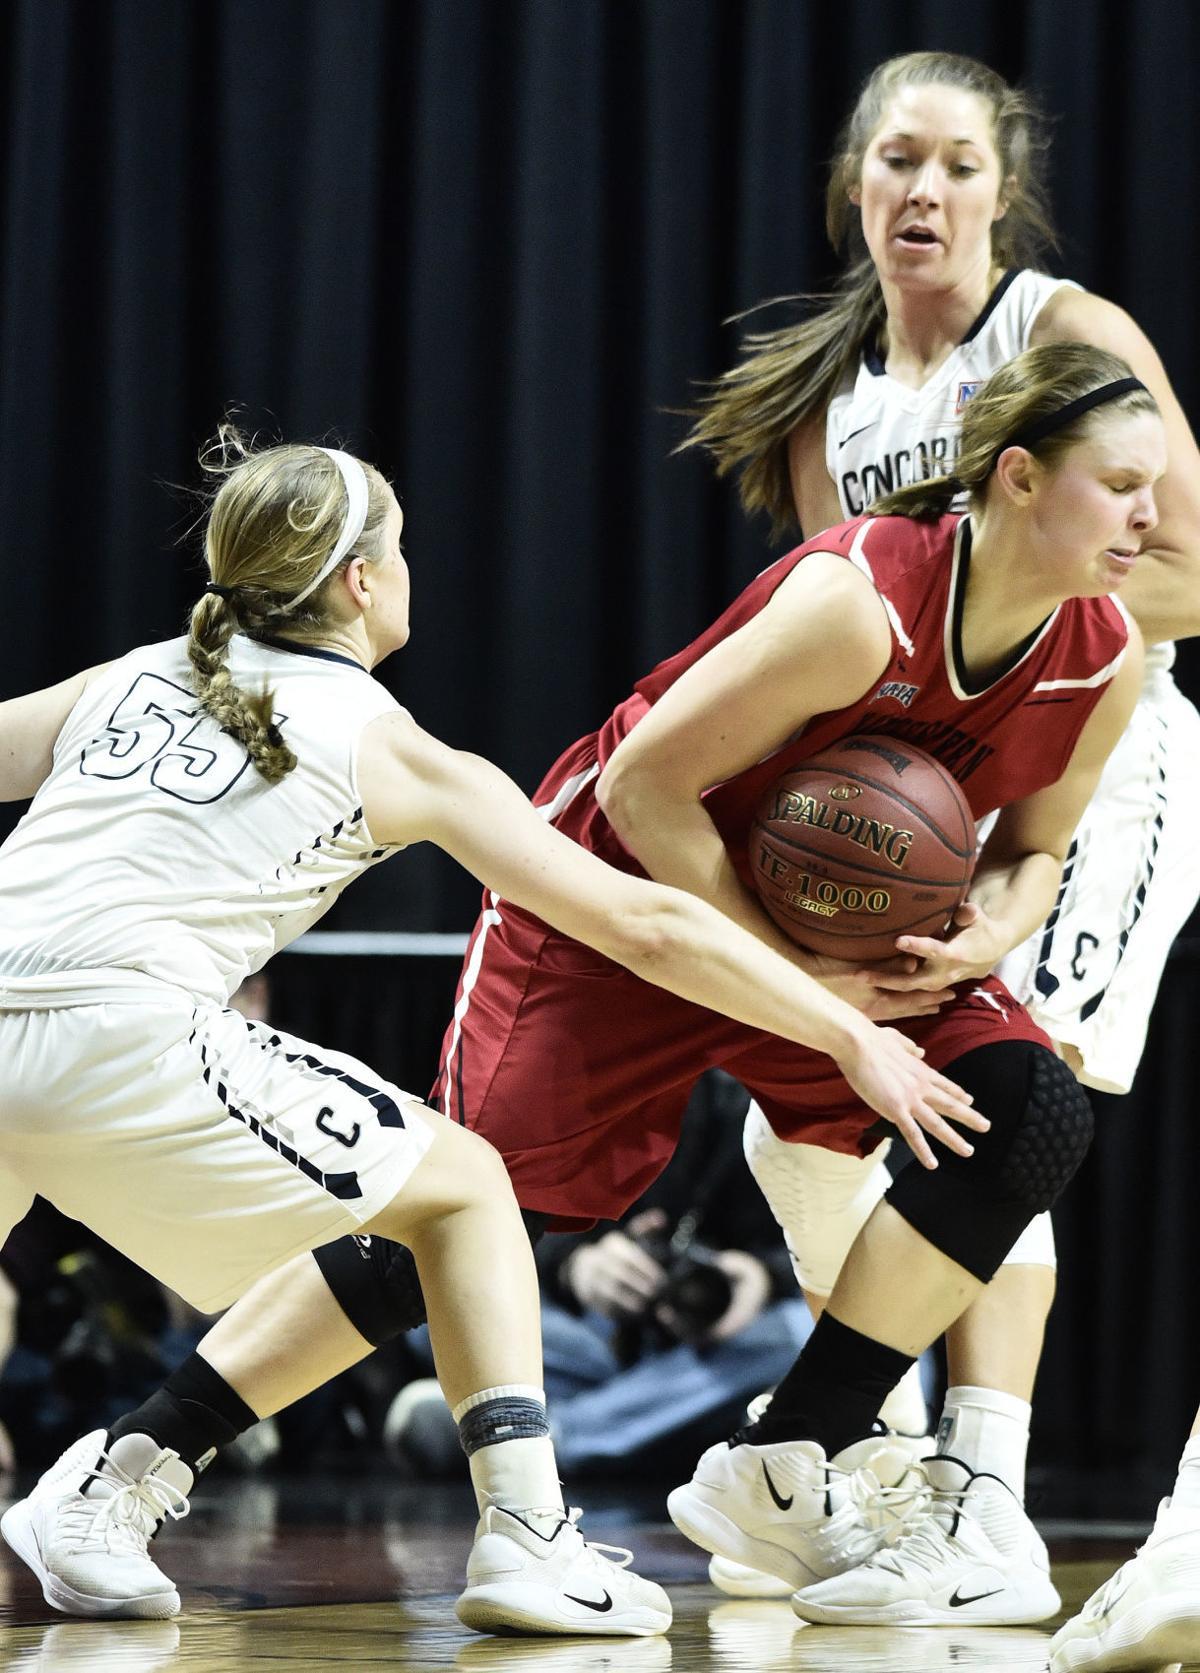 Northwestern vs Concordia NAIA basketball